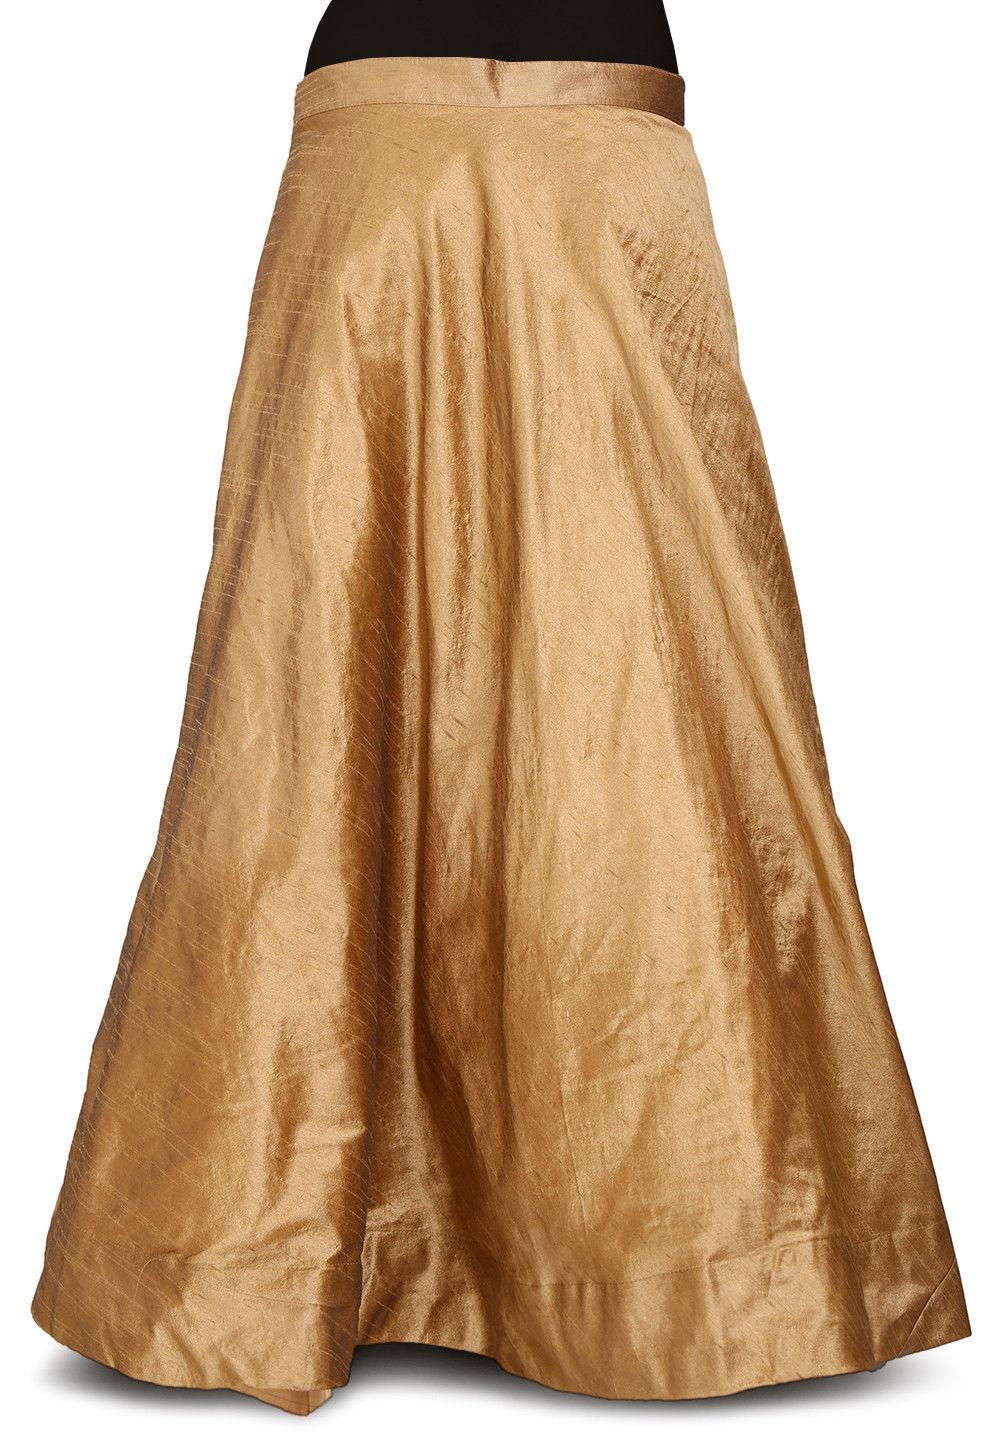 f3a1496b1e00 ... Plain Dupion Silk Skirt in Dark Beige. Zoom. View Similar